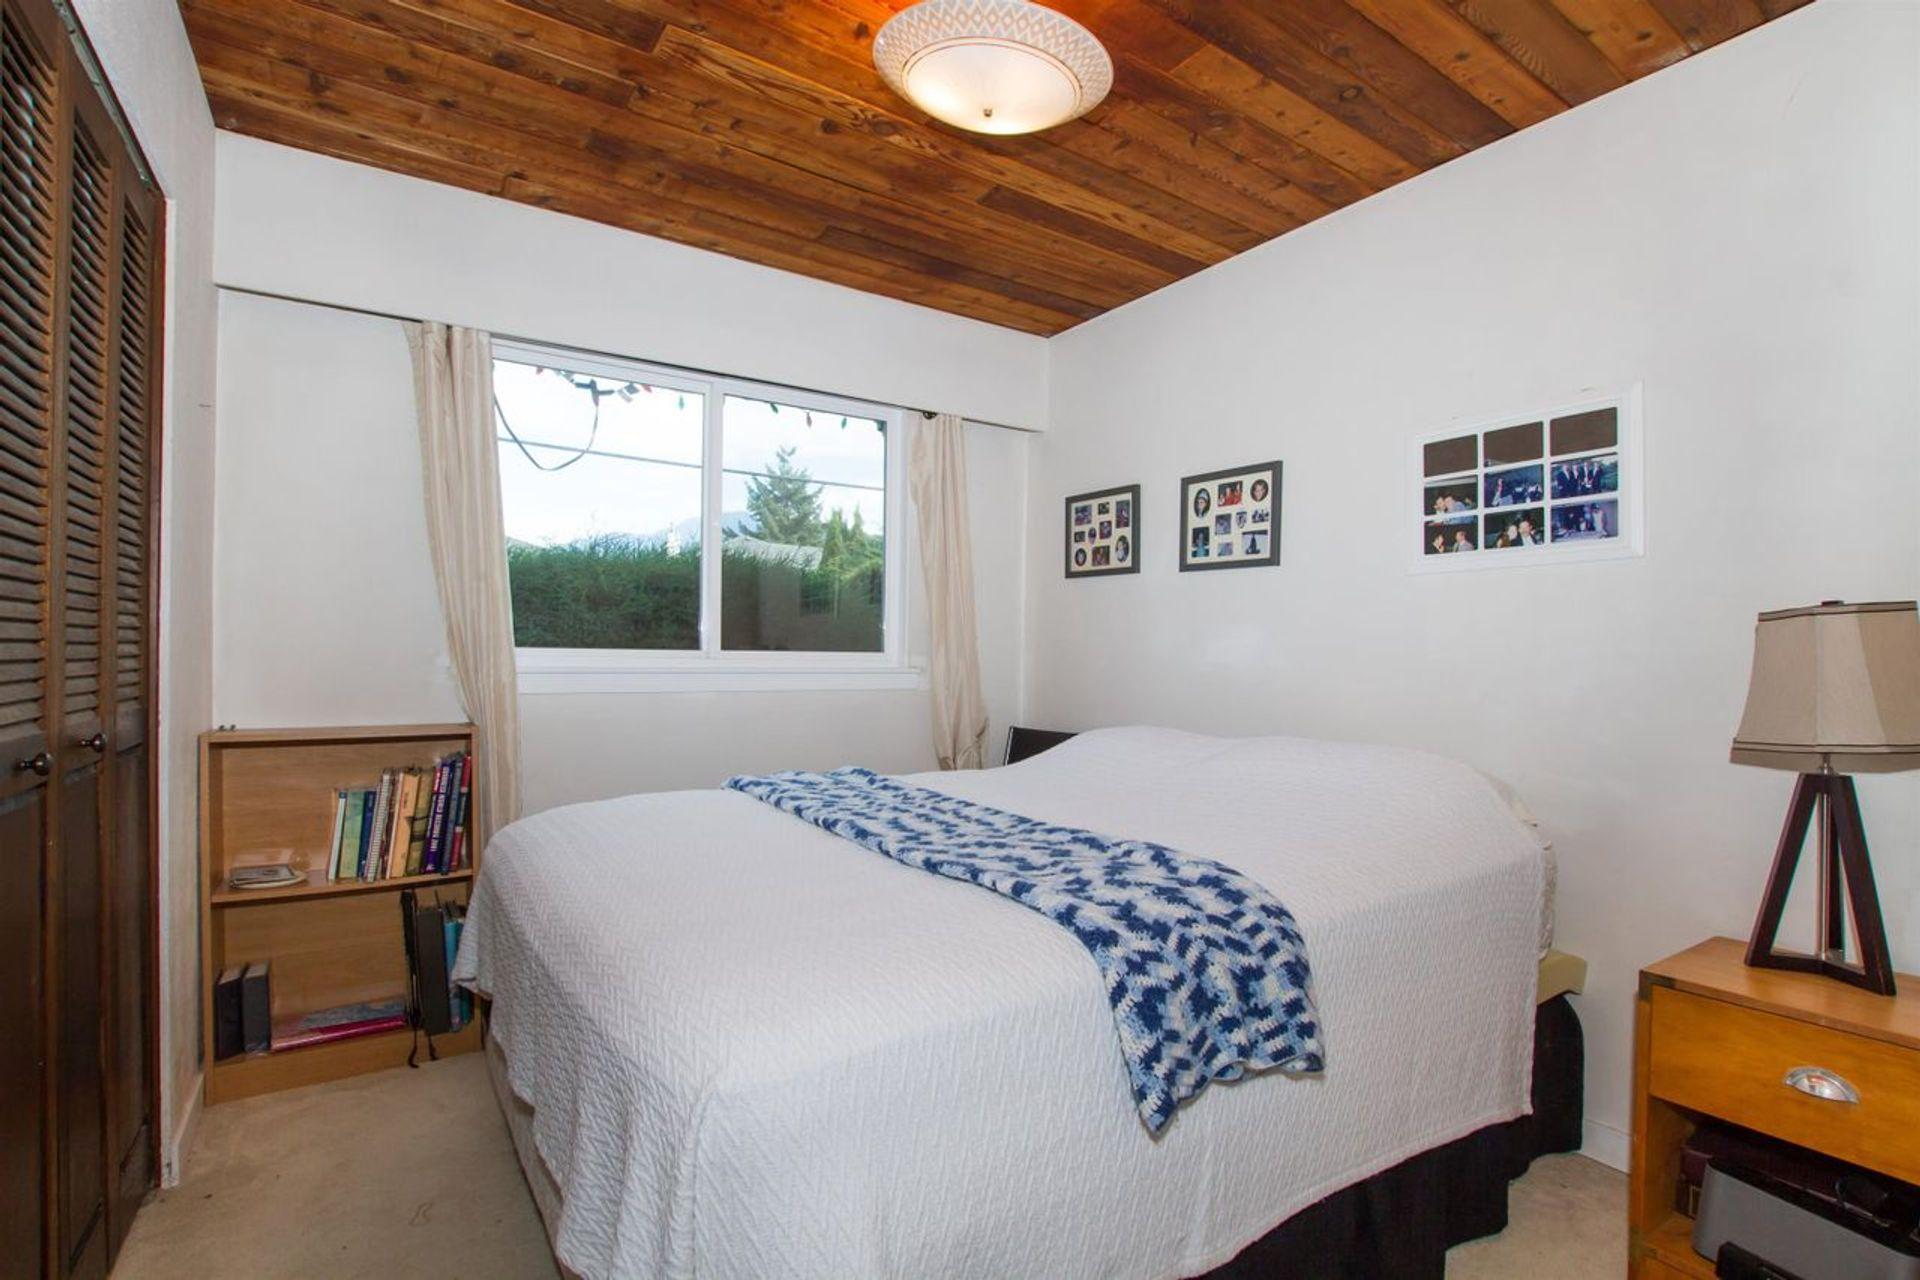 2040-diamond-road-garibaldi-estates-squamish-17 at 2040 Diamond Road, Garibaldi Estates, Squamish